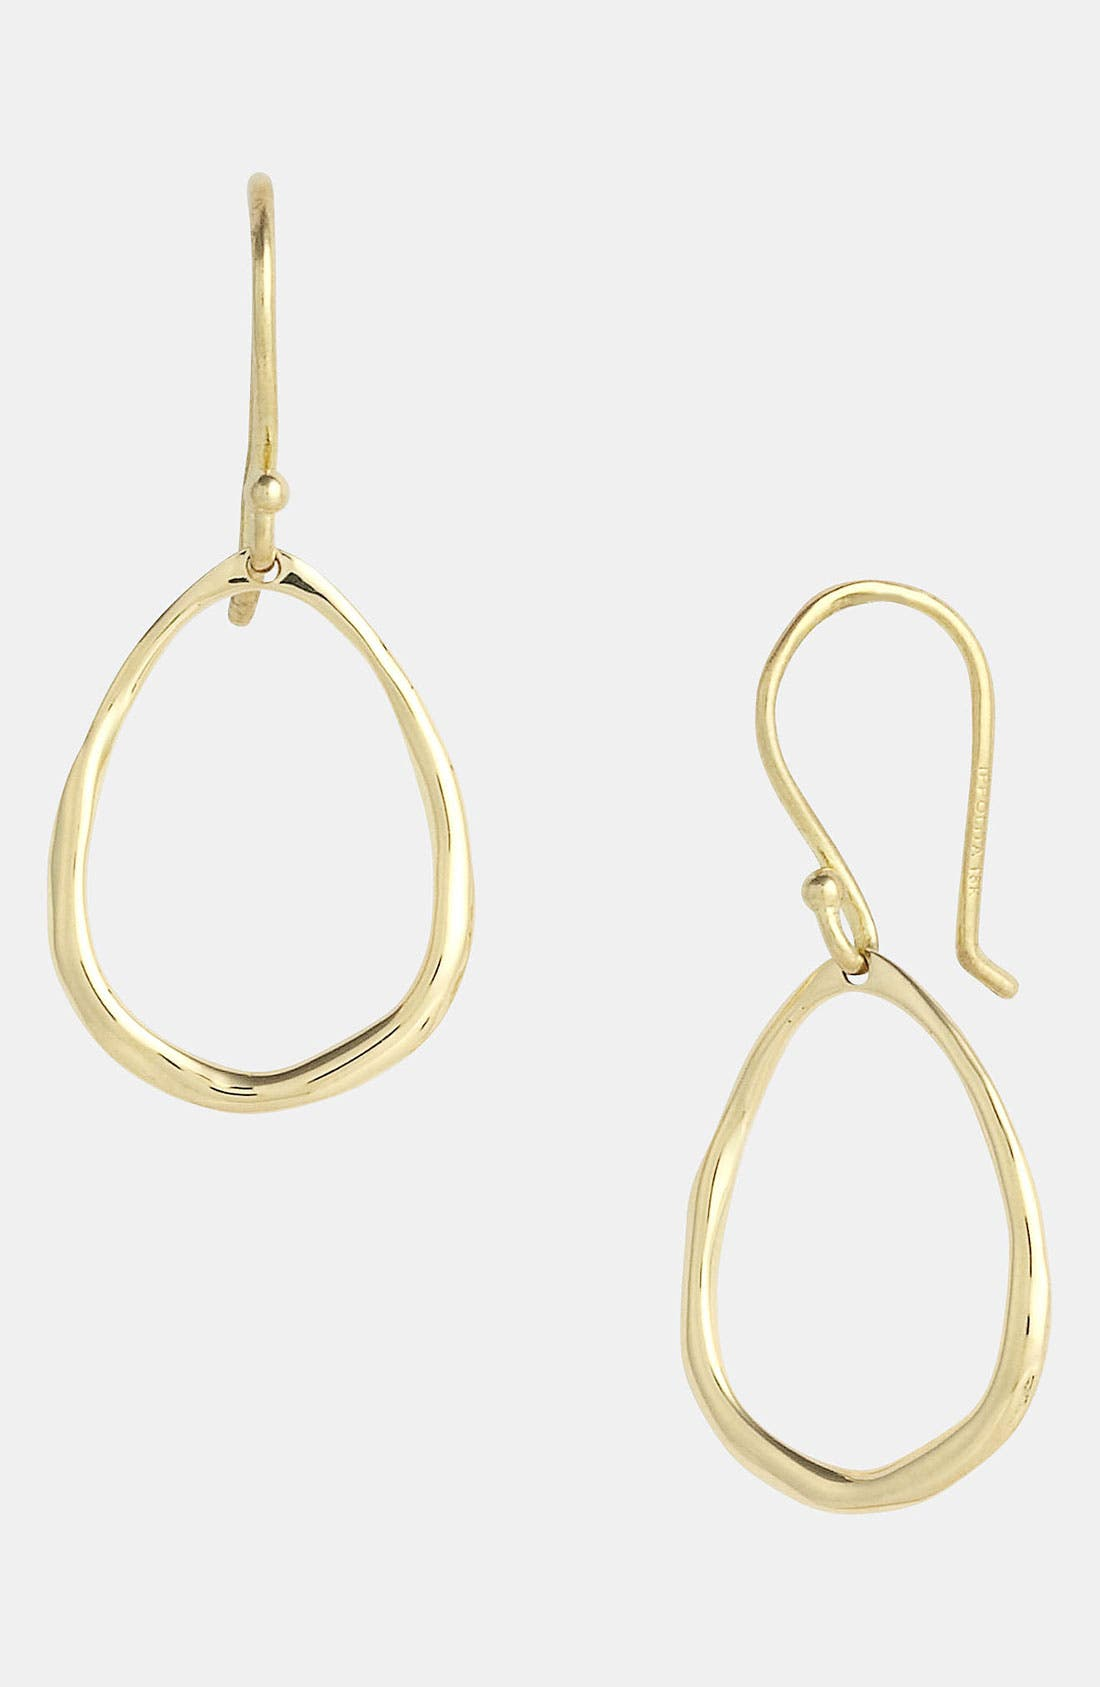 Main Image - Ippolita 'Plain' Mini Squiggle Oval 18k Gold Earrings